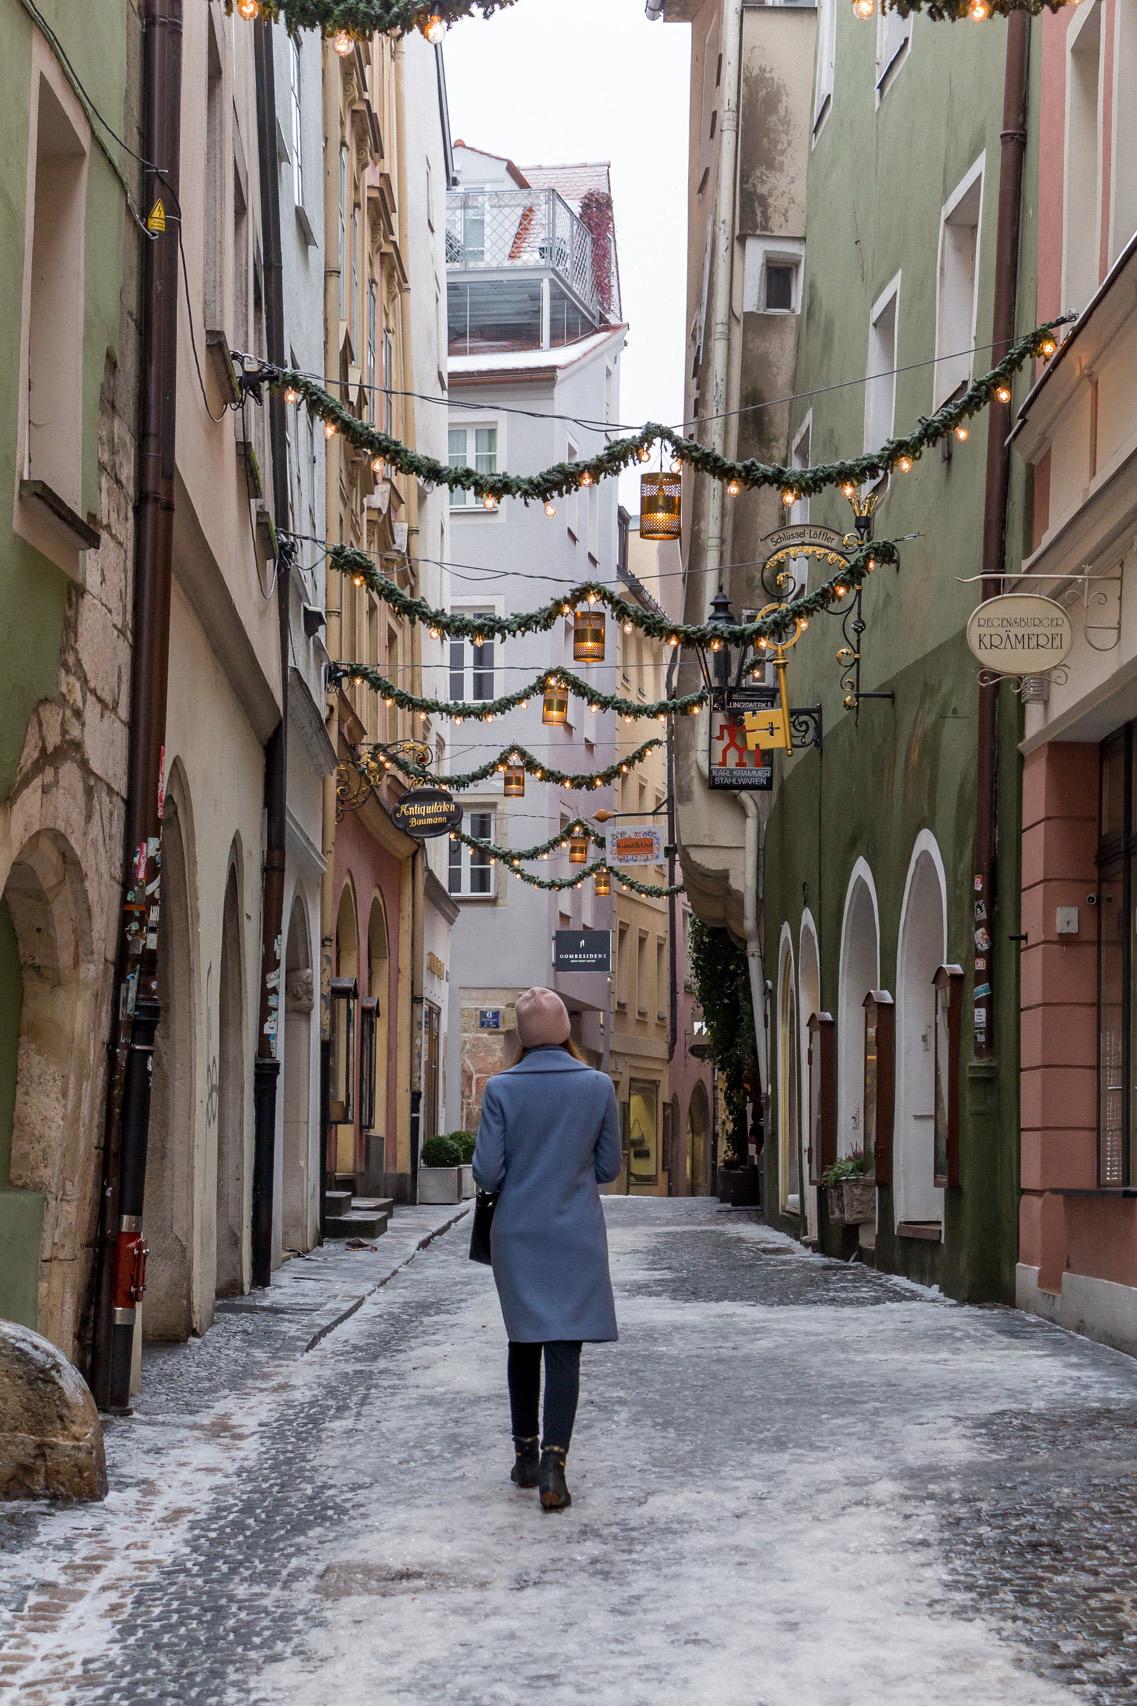 The-Mint-Story-Regensburg